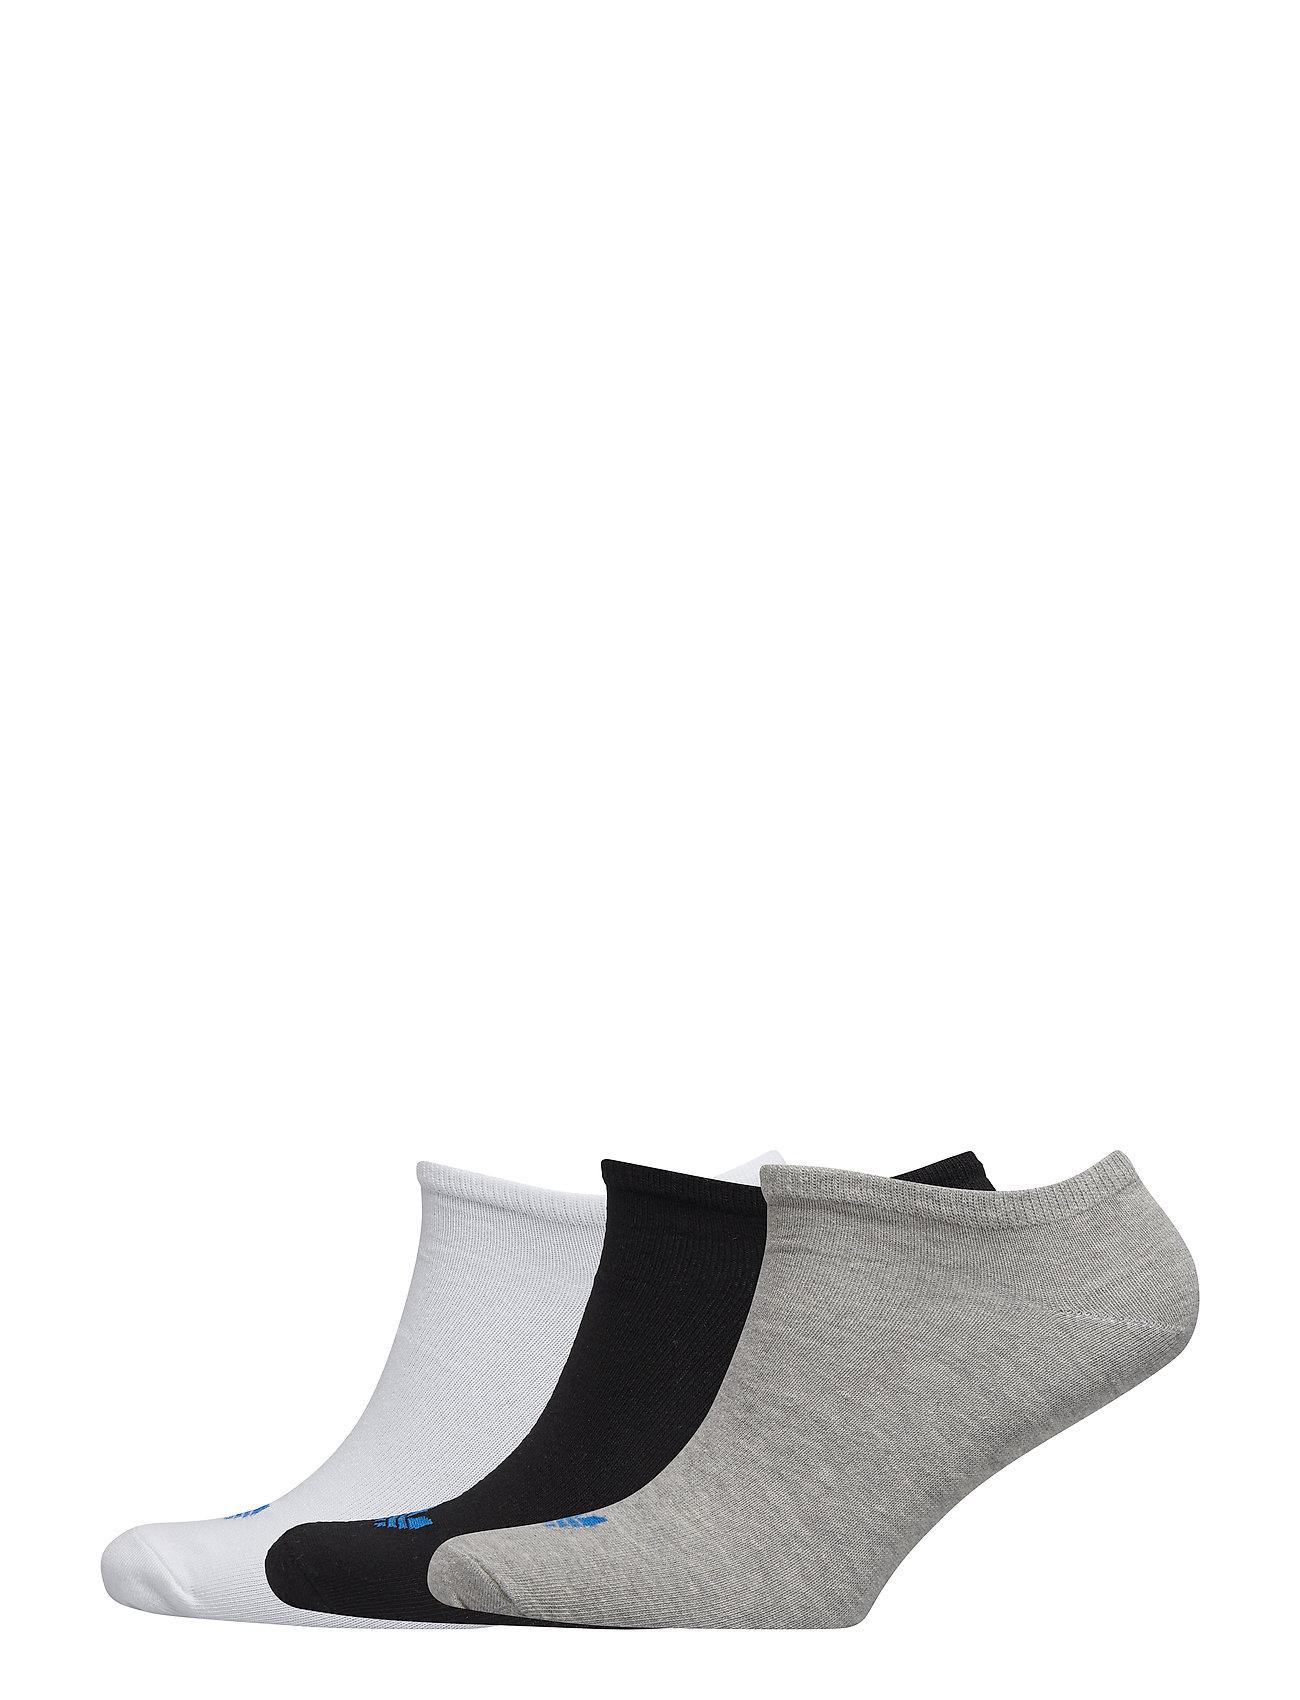 adidas Originals TREFOIL LINER - WHITE/BLACK/MGREYH